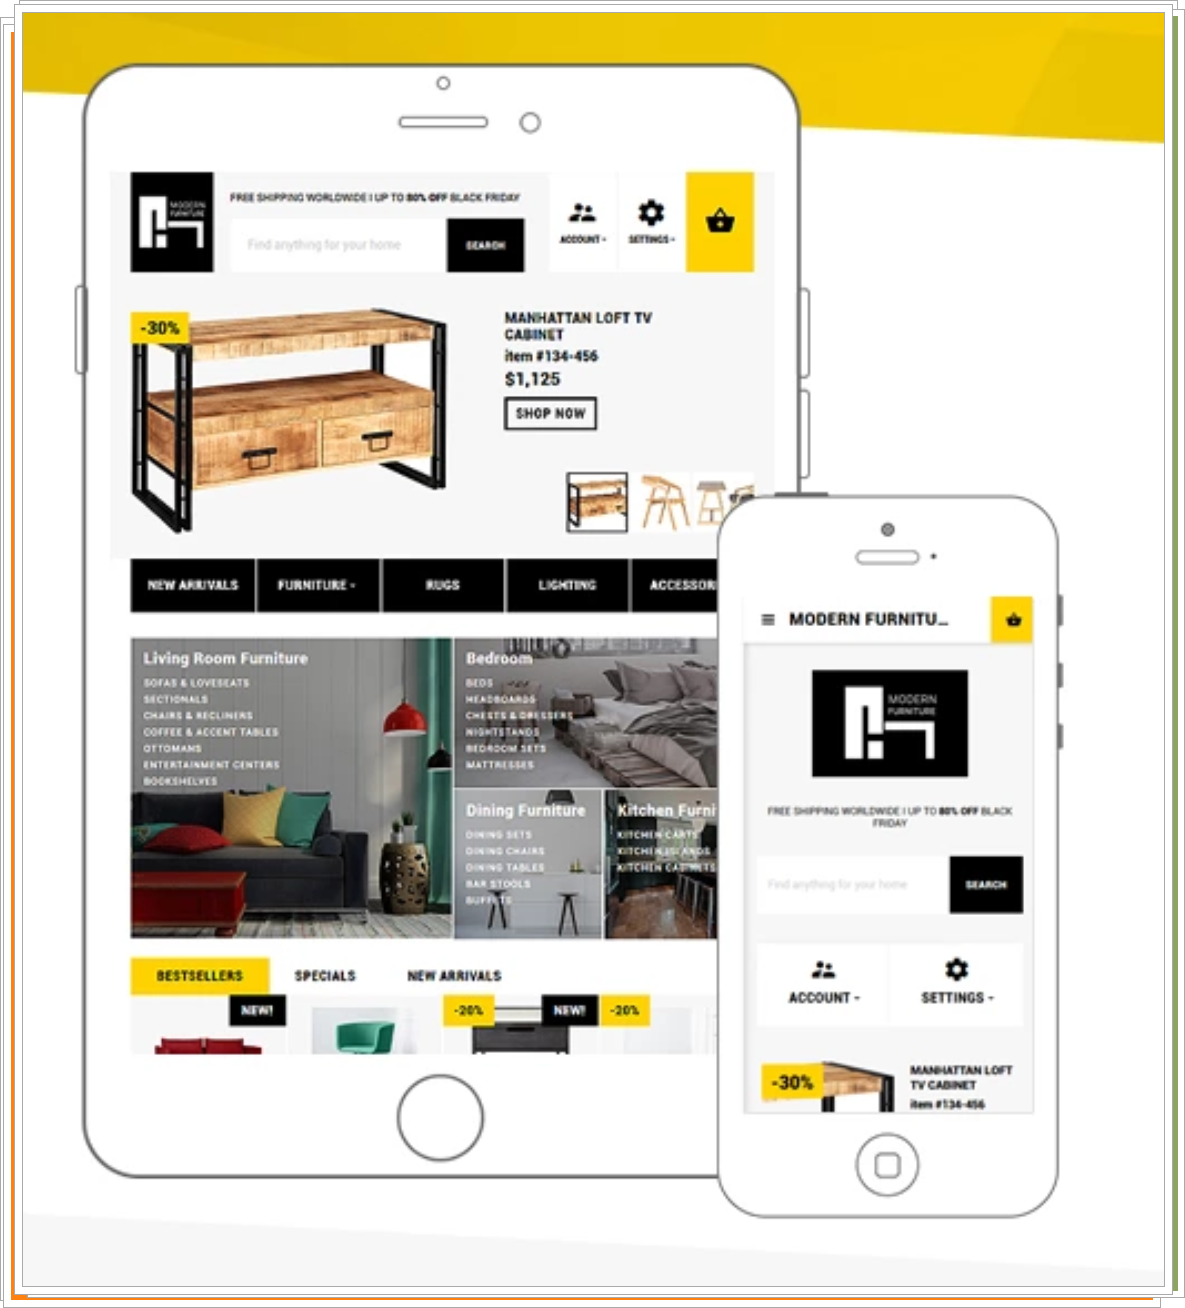 Modern Furniture - Interior & Home Decor Plantilla Responsive para OpenCart